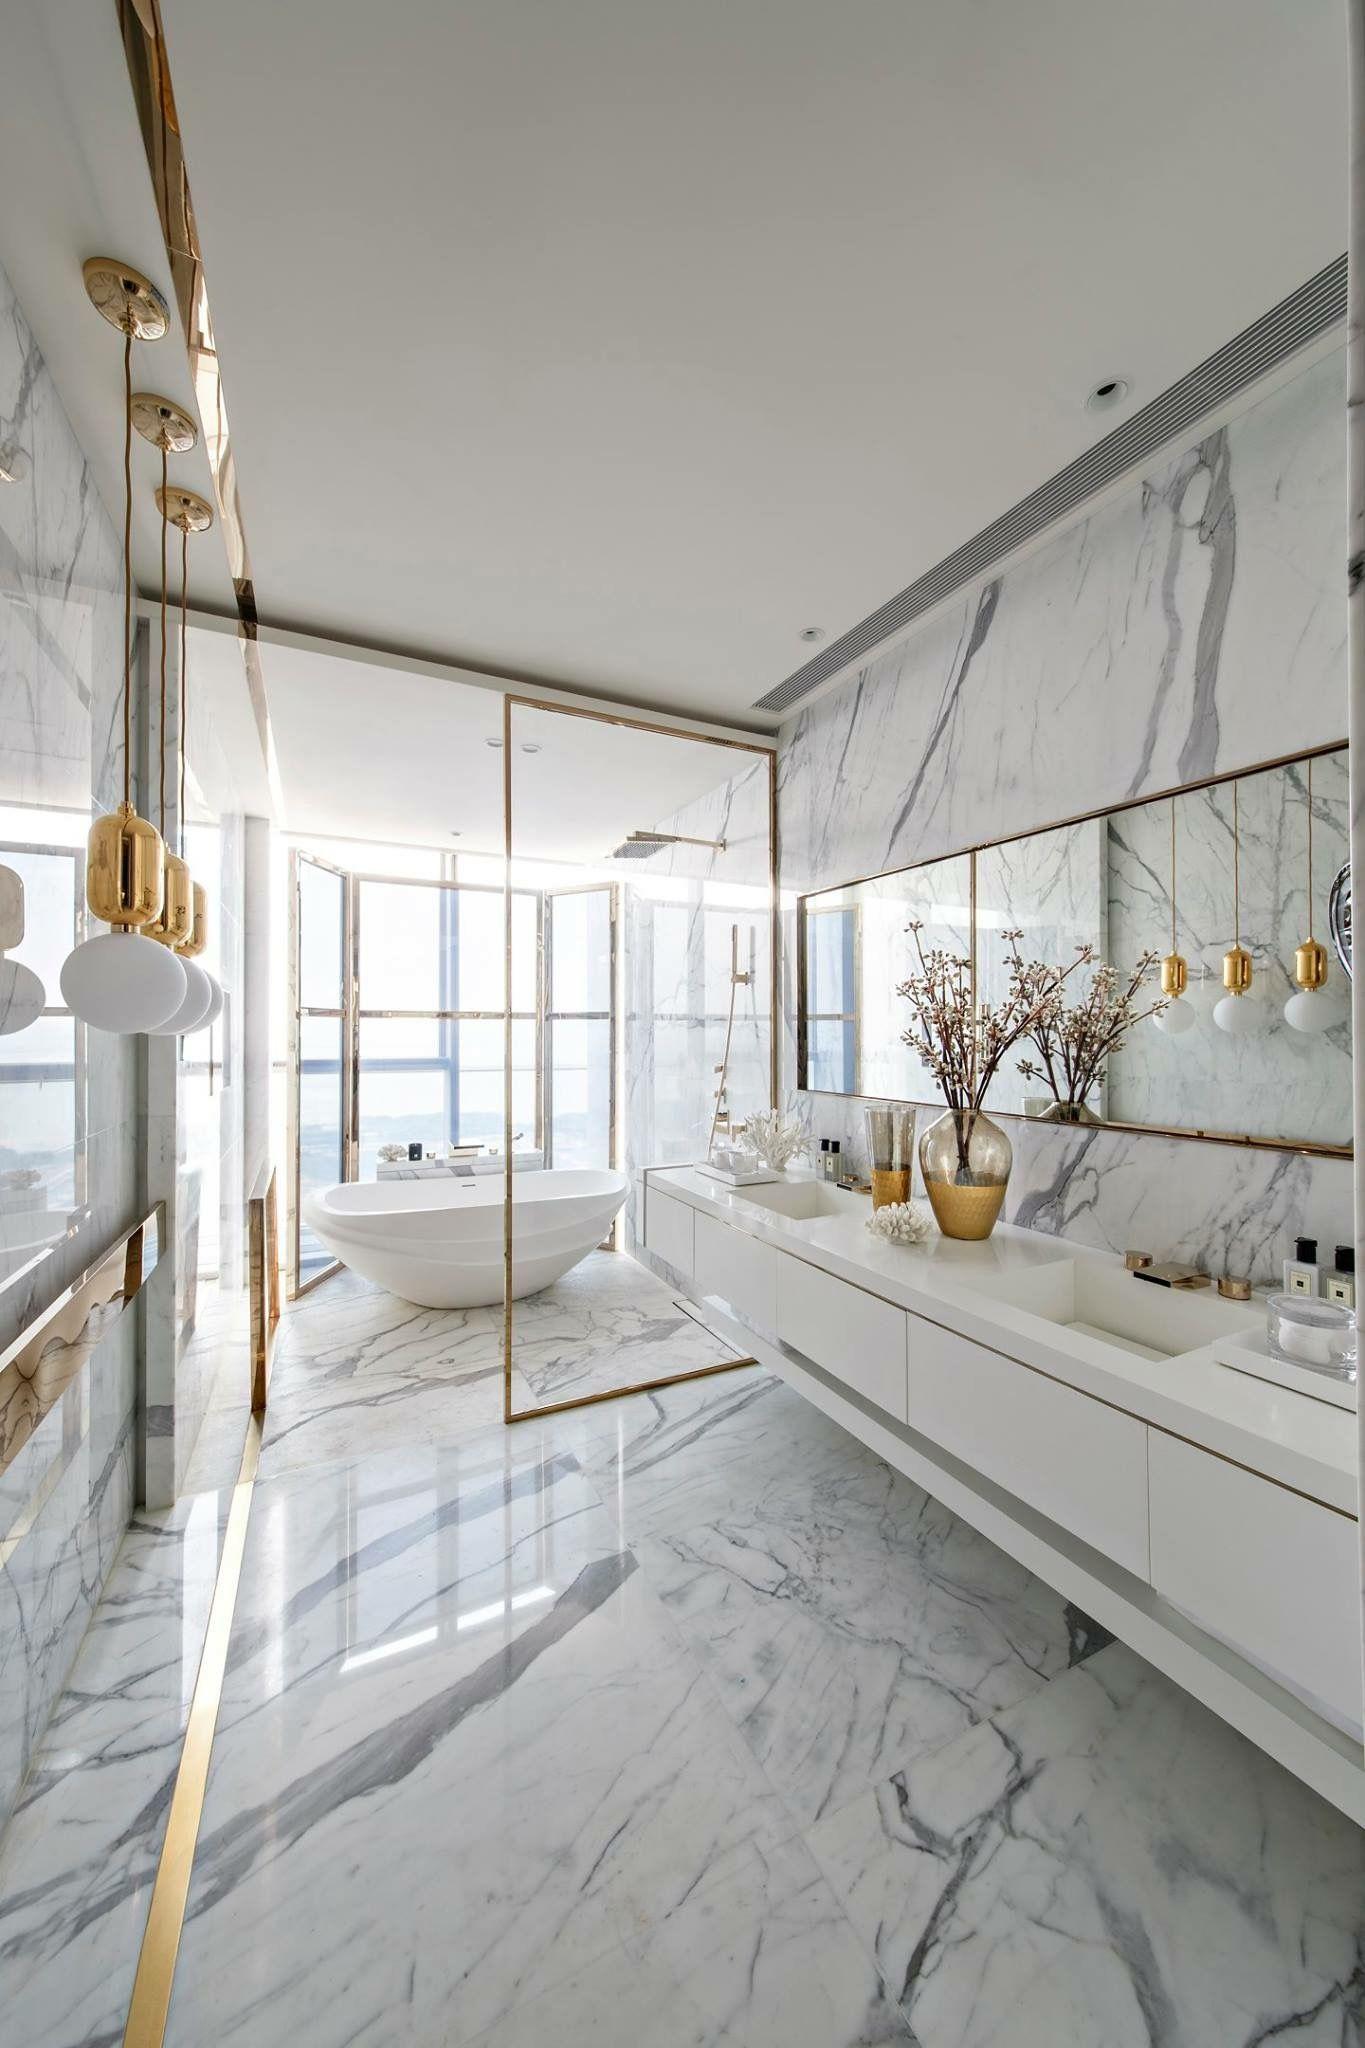 Marvellous Bathrooms Idea 3904363576 More Incredible Stuff On Images To Plan A P Bathroom Decor Luxury Contemporary Bathroom Designs Bathroom Interior Design